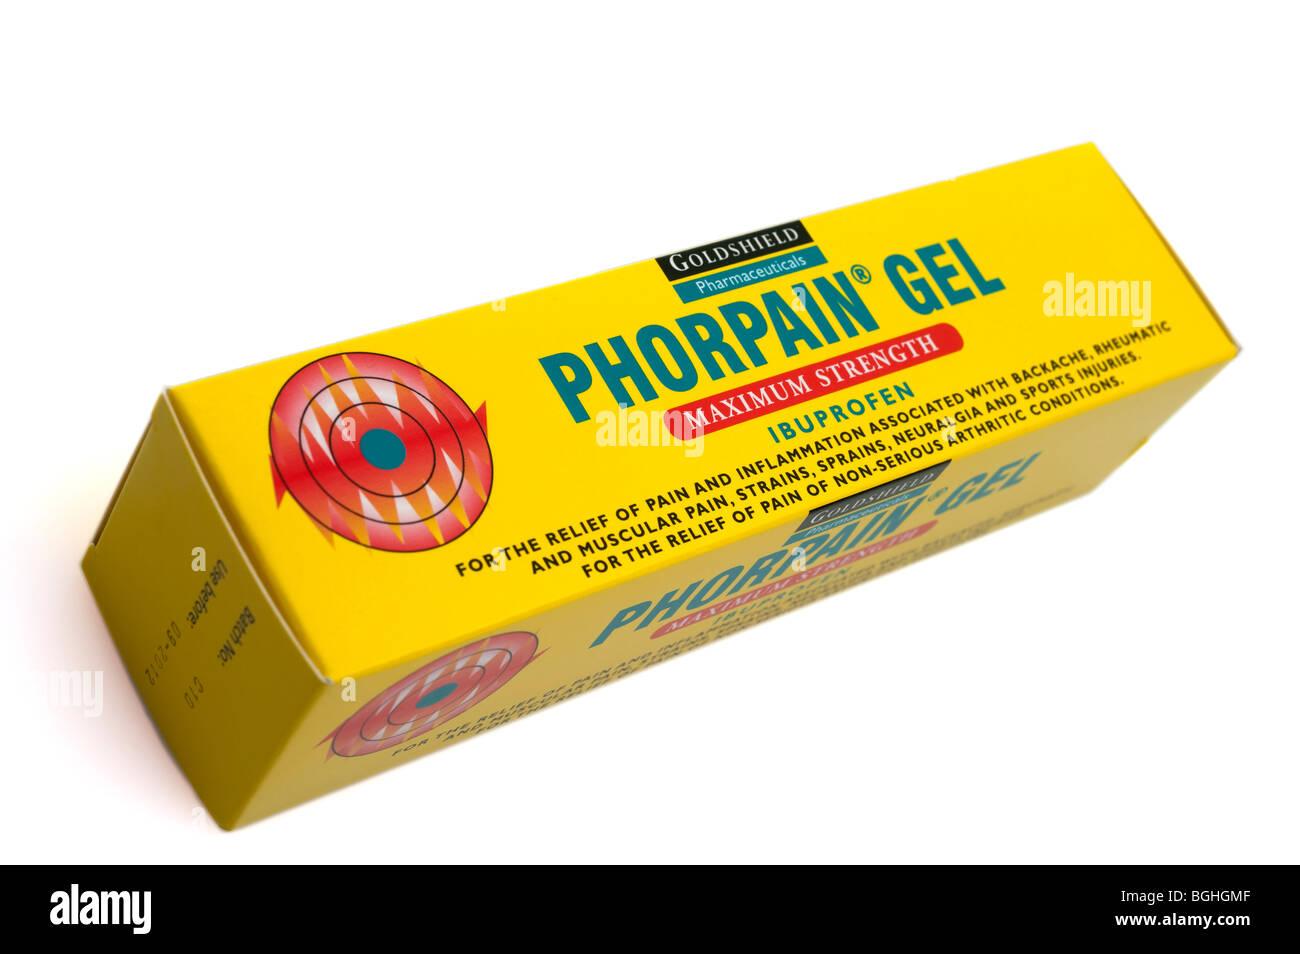 Phorpain maximum strength ibuprofen gel - Stock Image